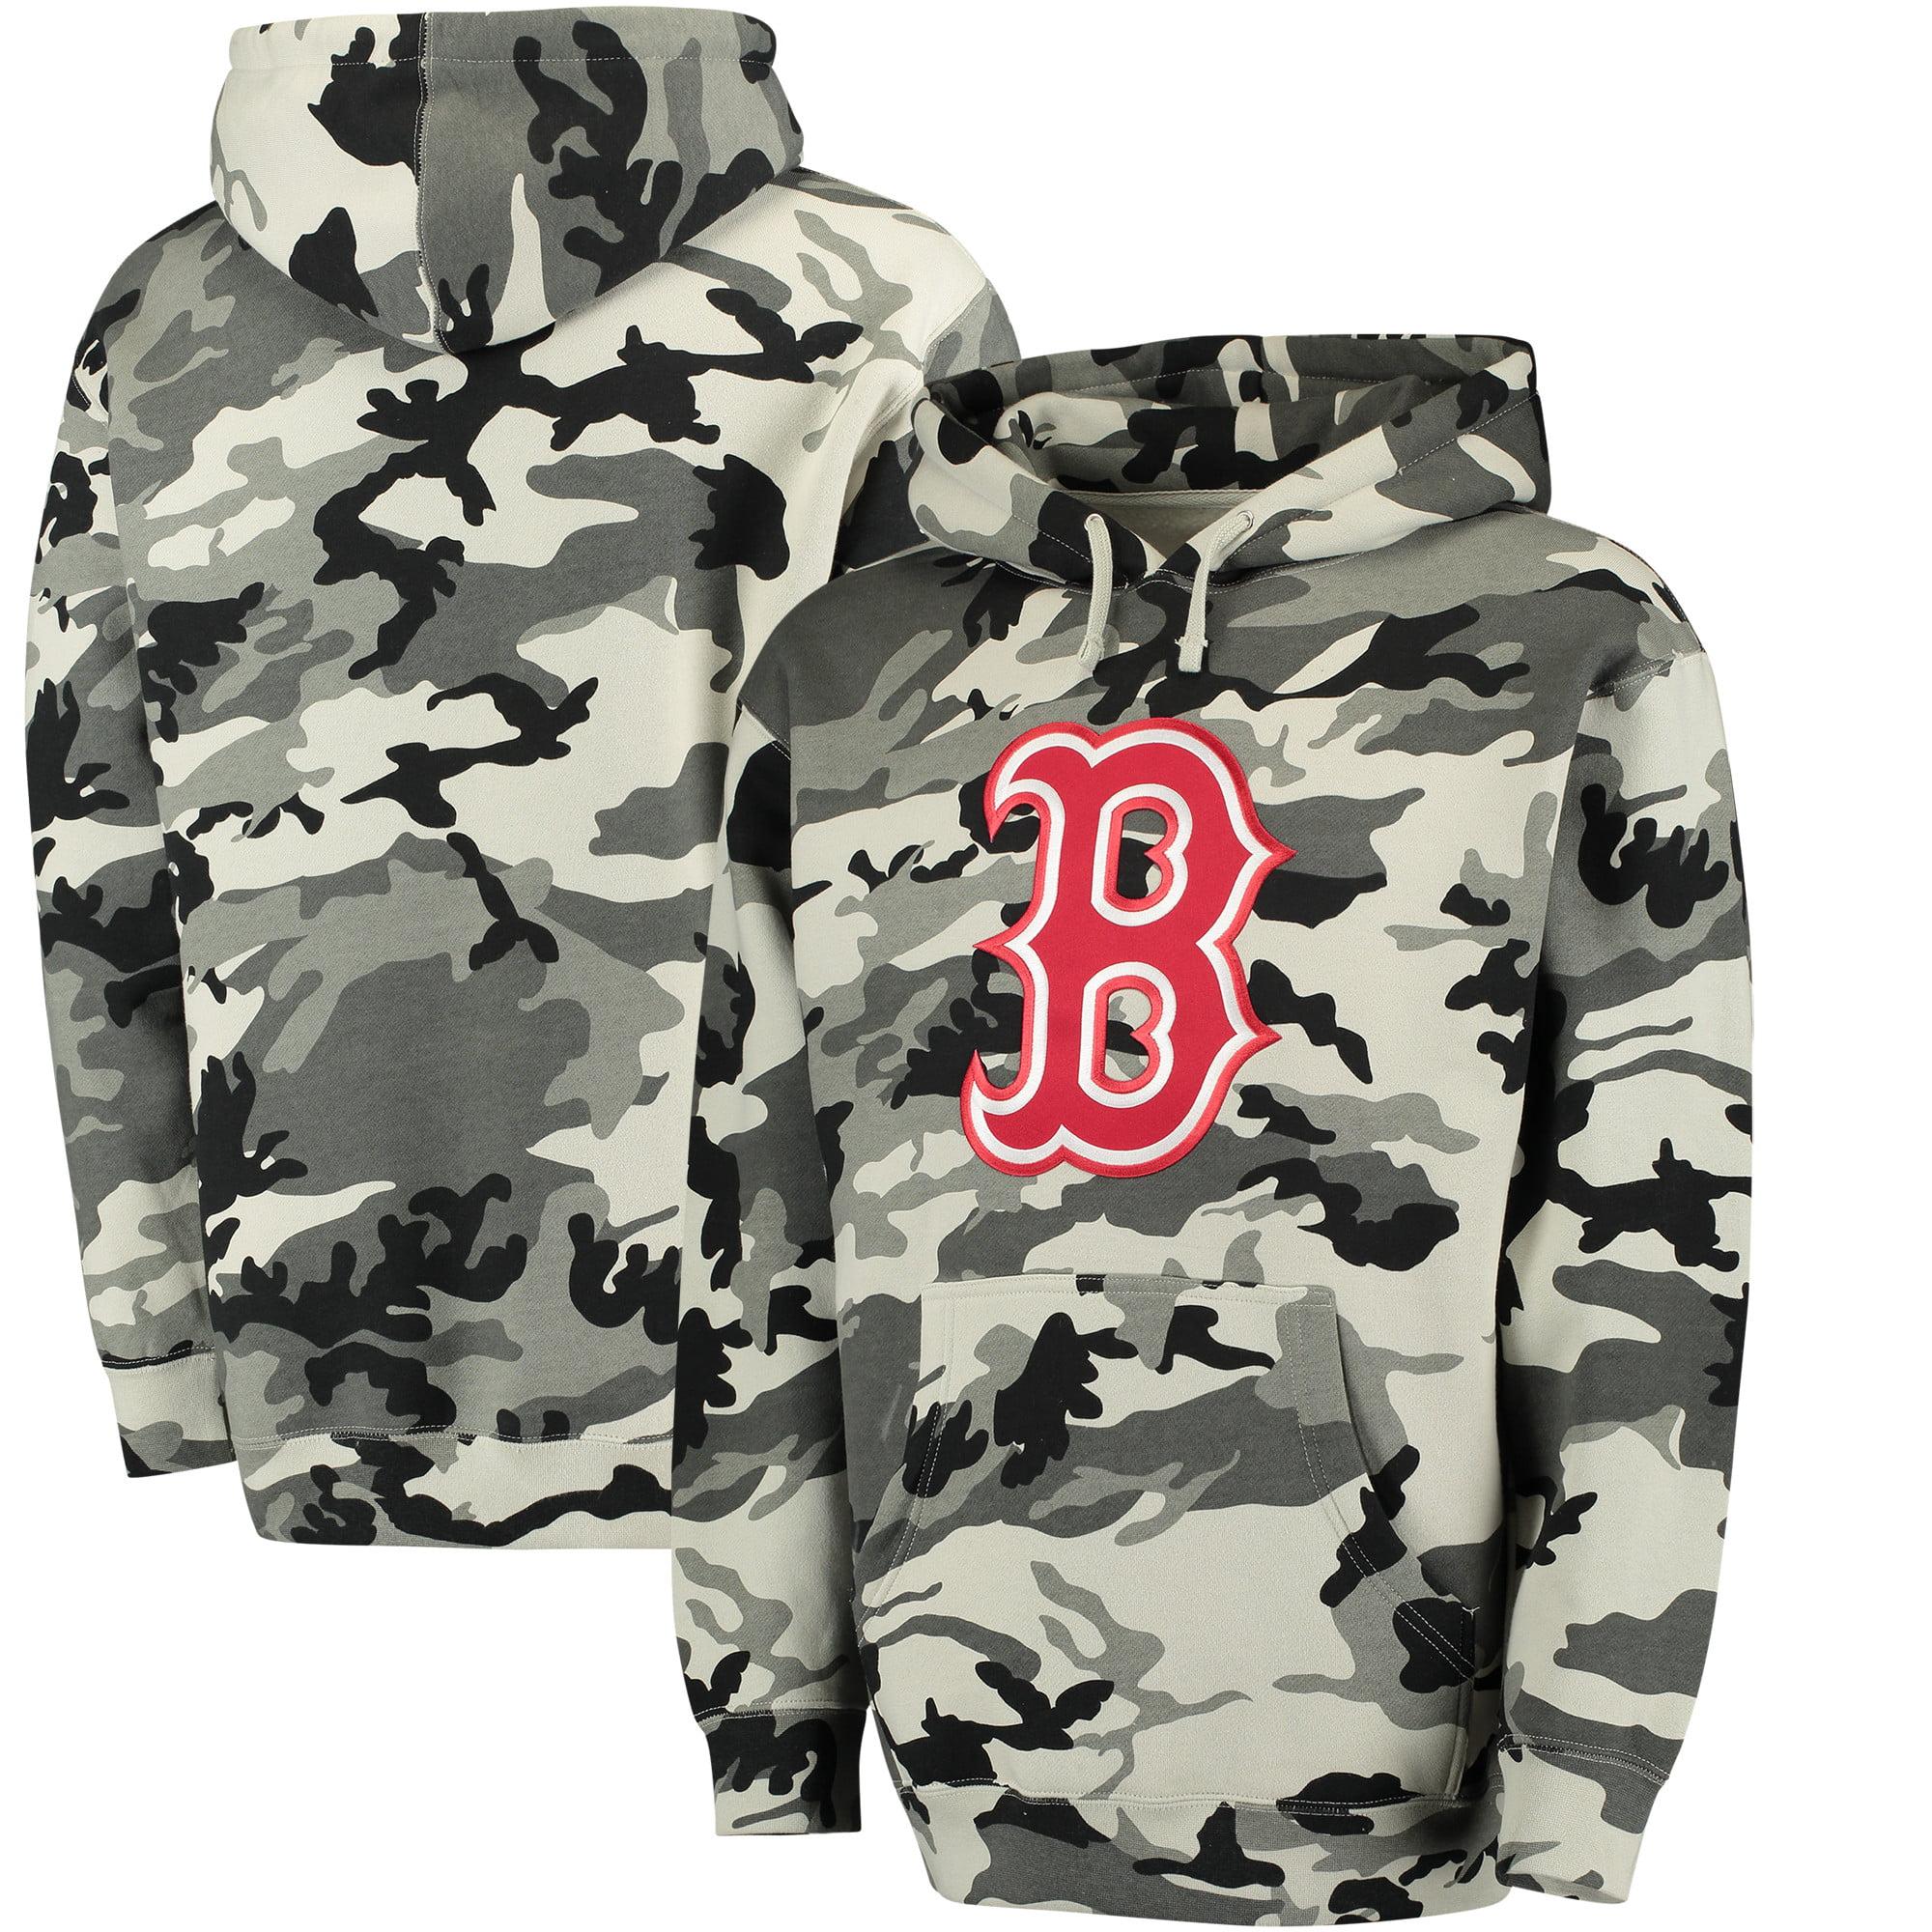 Boston Red Sox Stitches Pullover Hoodie - Black/Camo